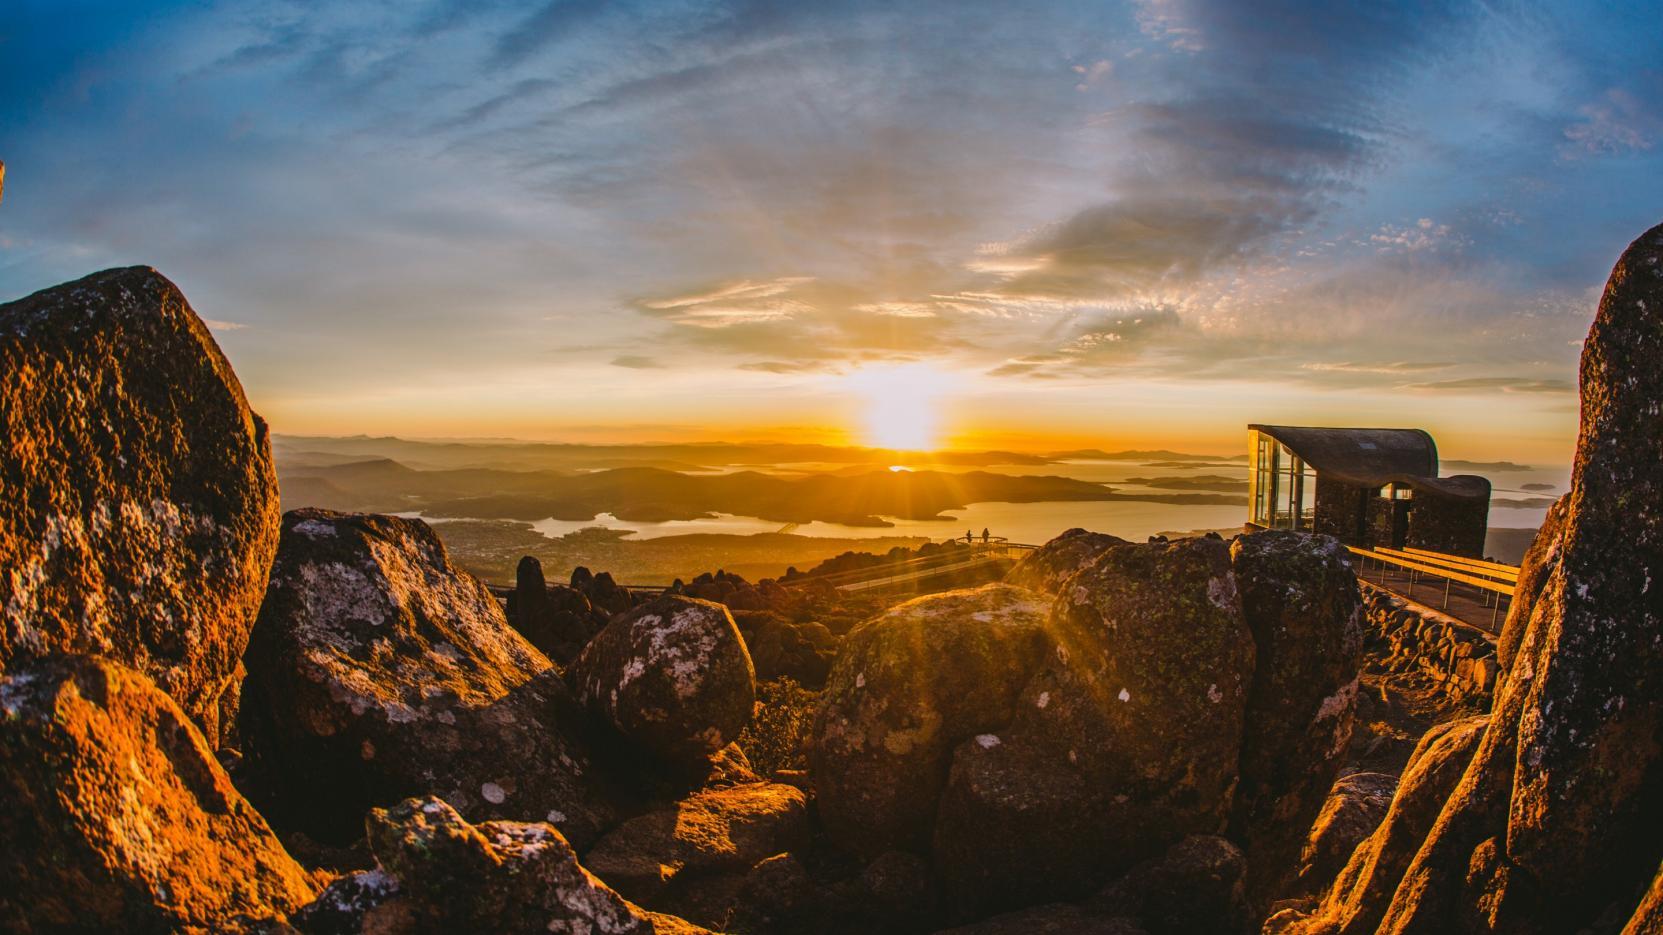 tasmania road trip itinerary